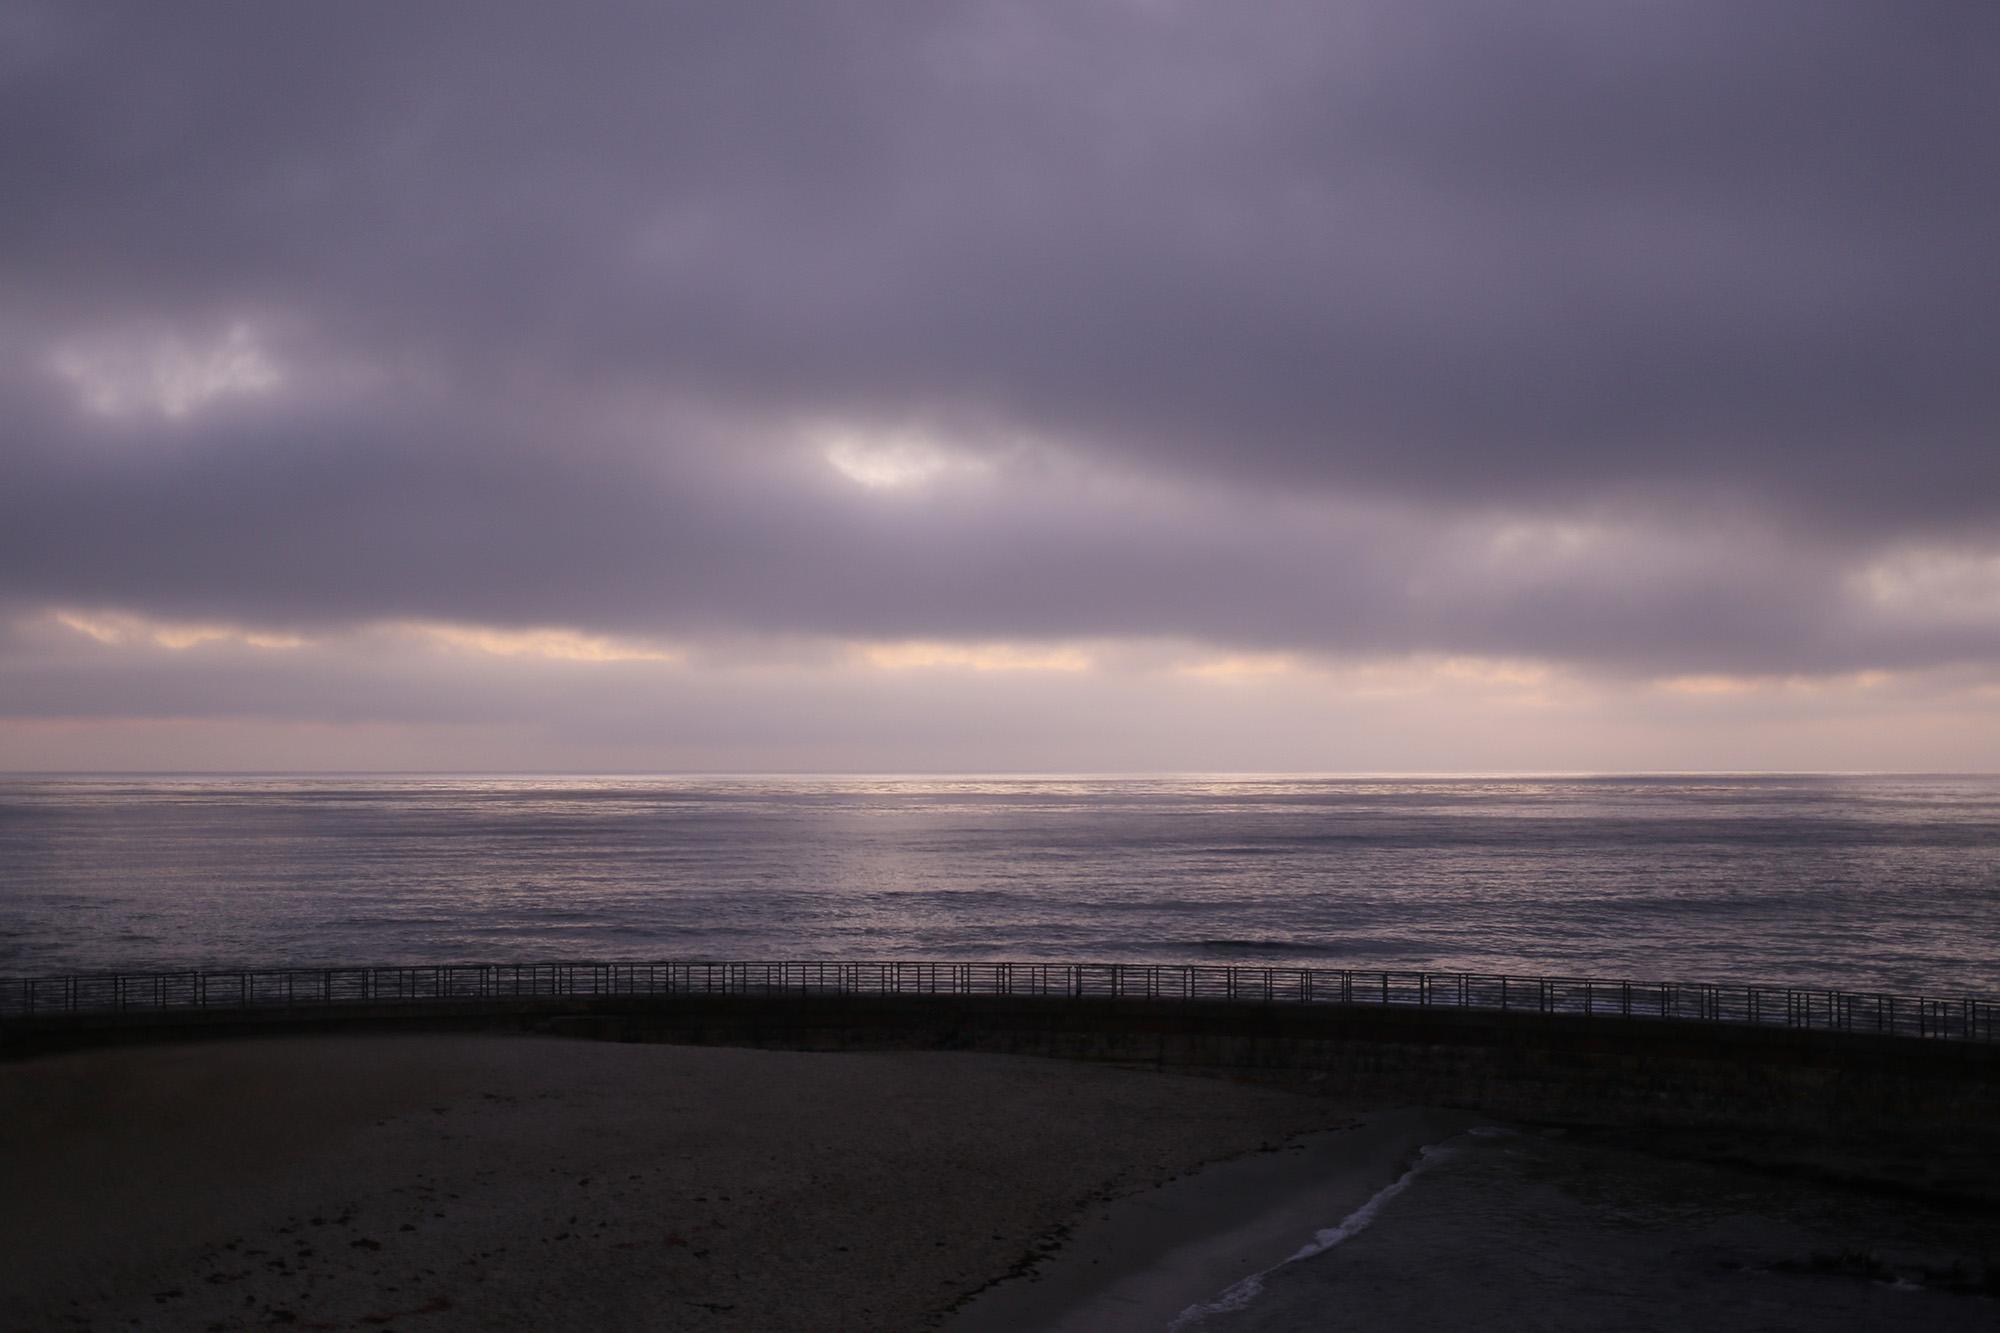 Mystical Dawn by Rich J. Velasco